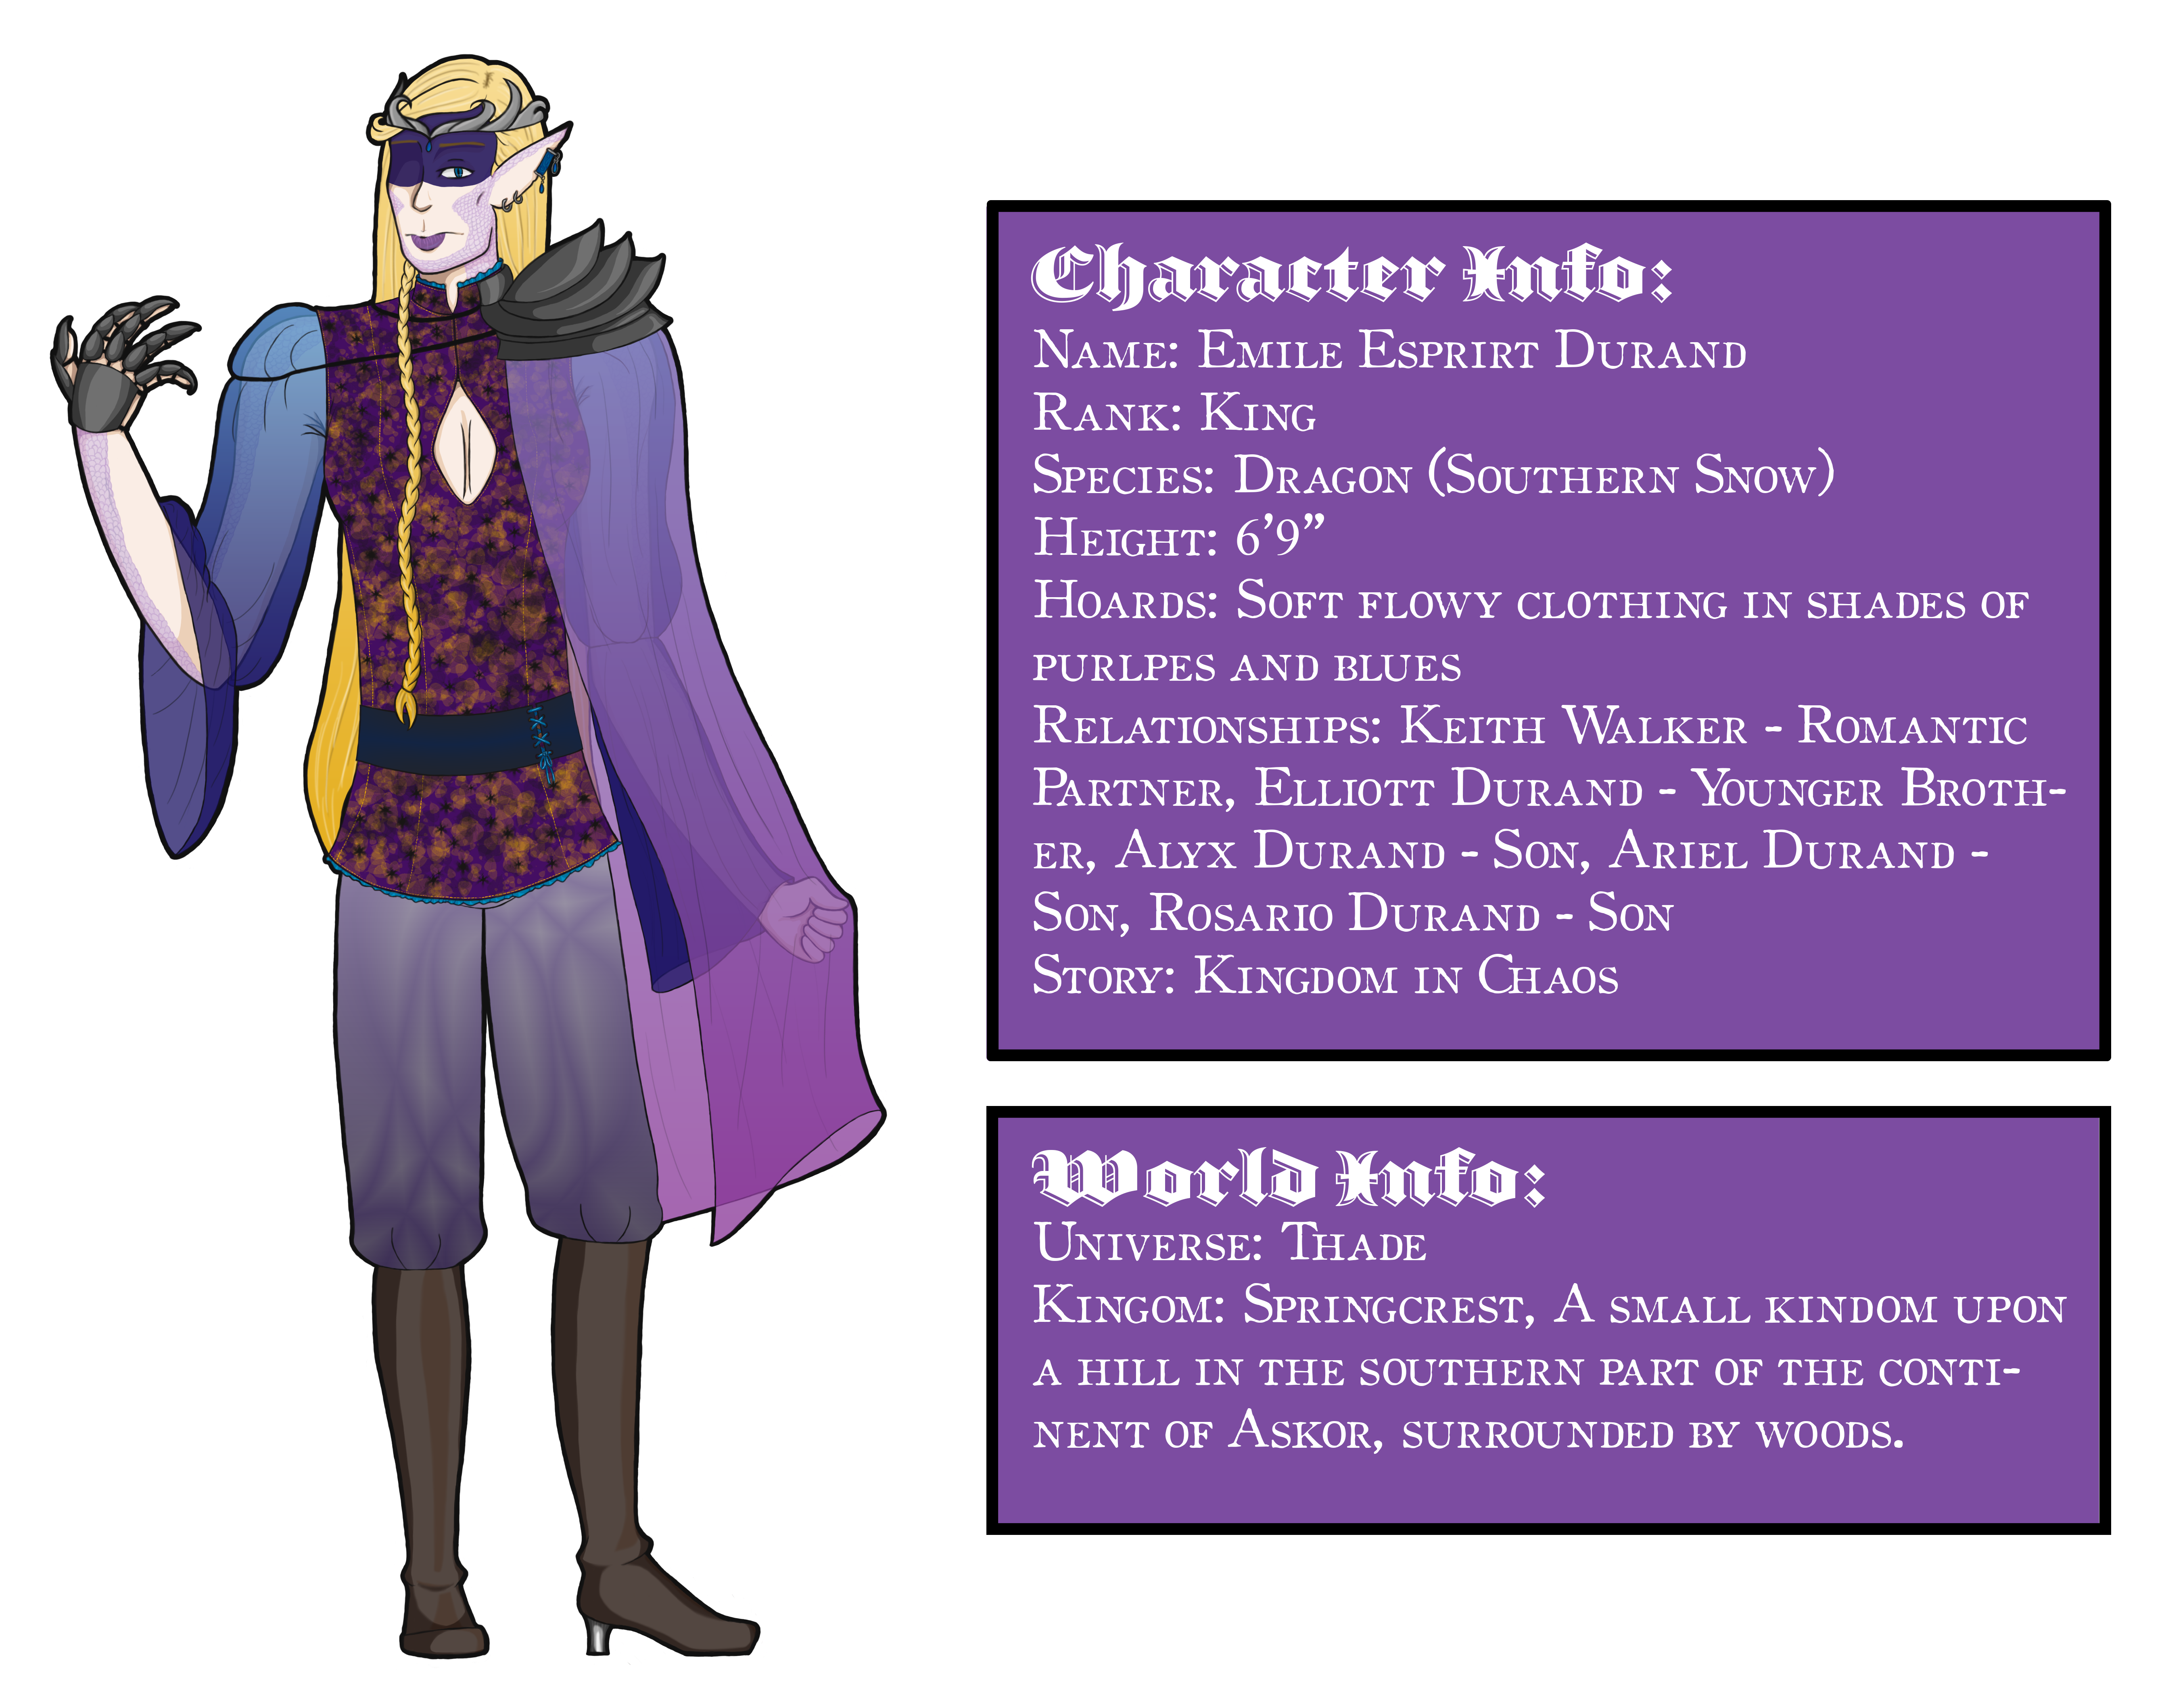 Thade Character Sheet - Emile Durand